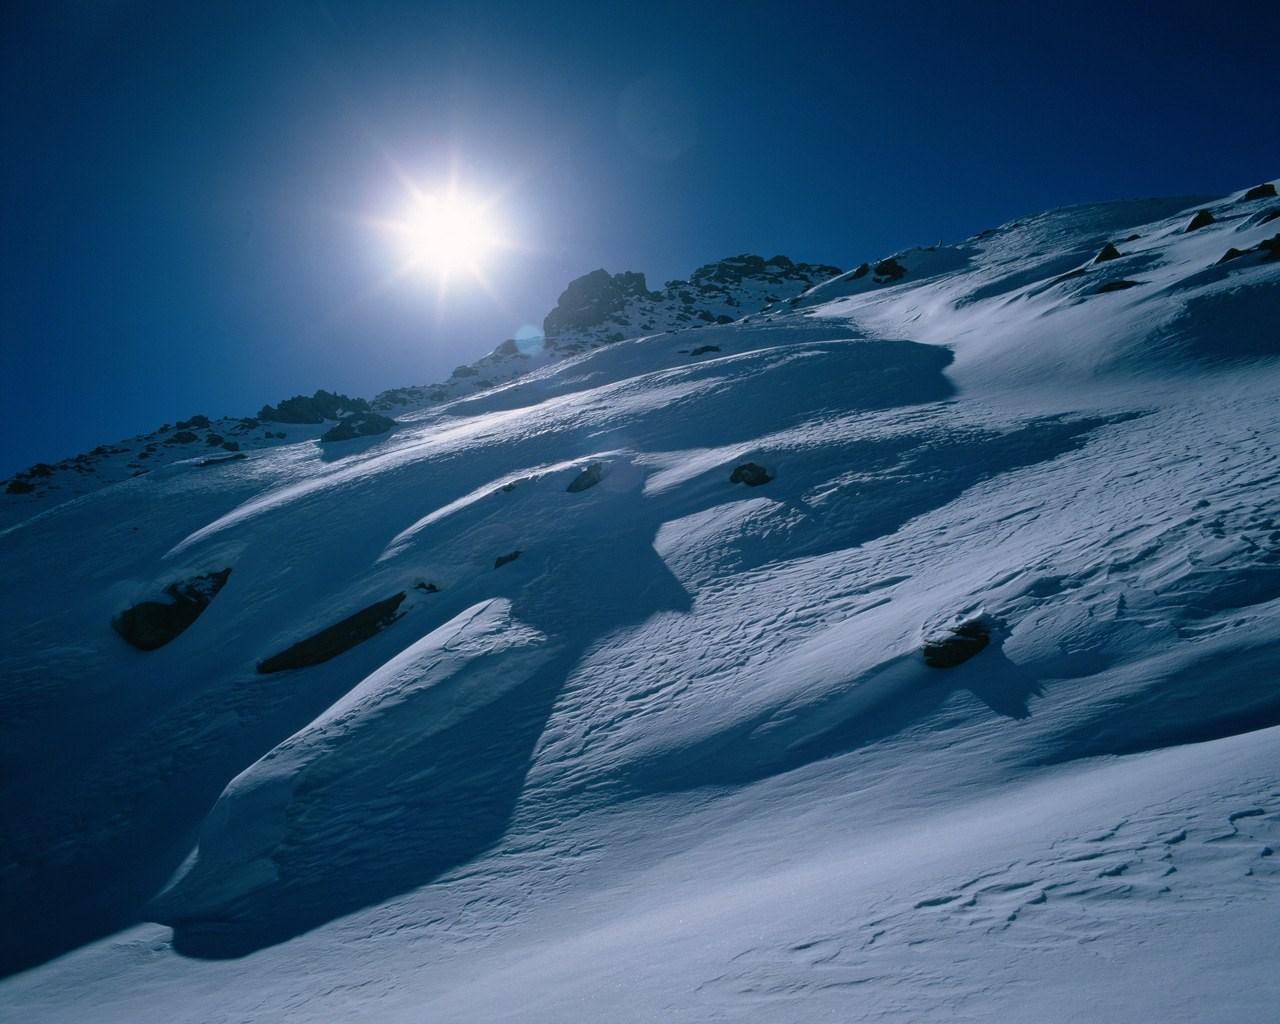 Beautiful Snowflake In The Sunlight: Sun In Beautiful Winter Wallpaper [1280x1024]